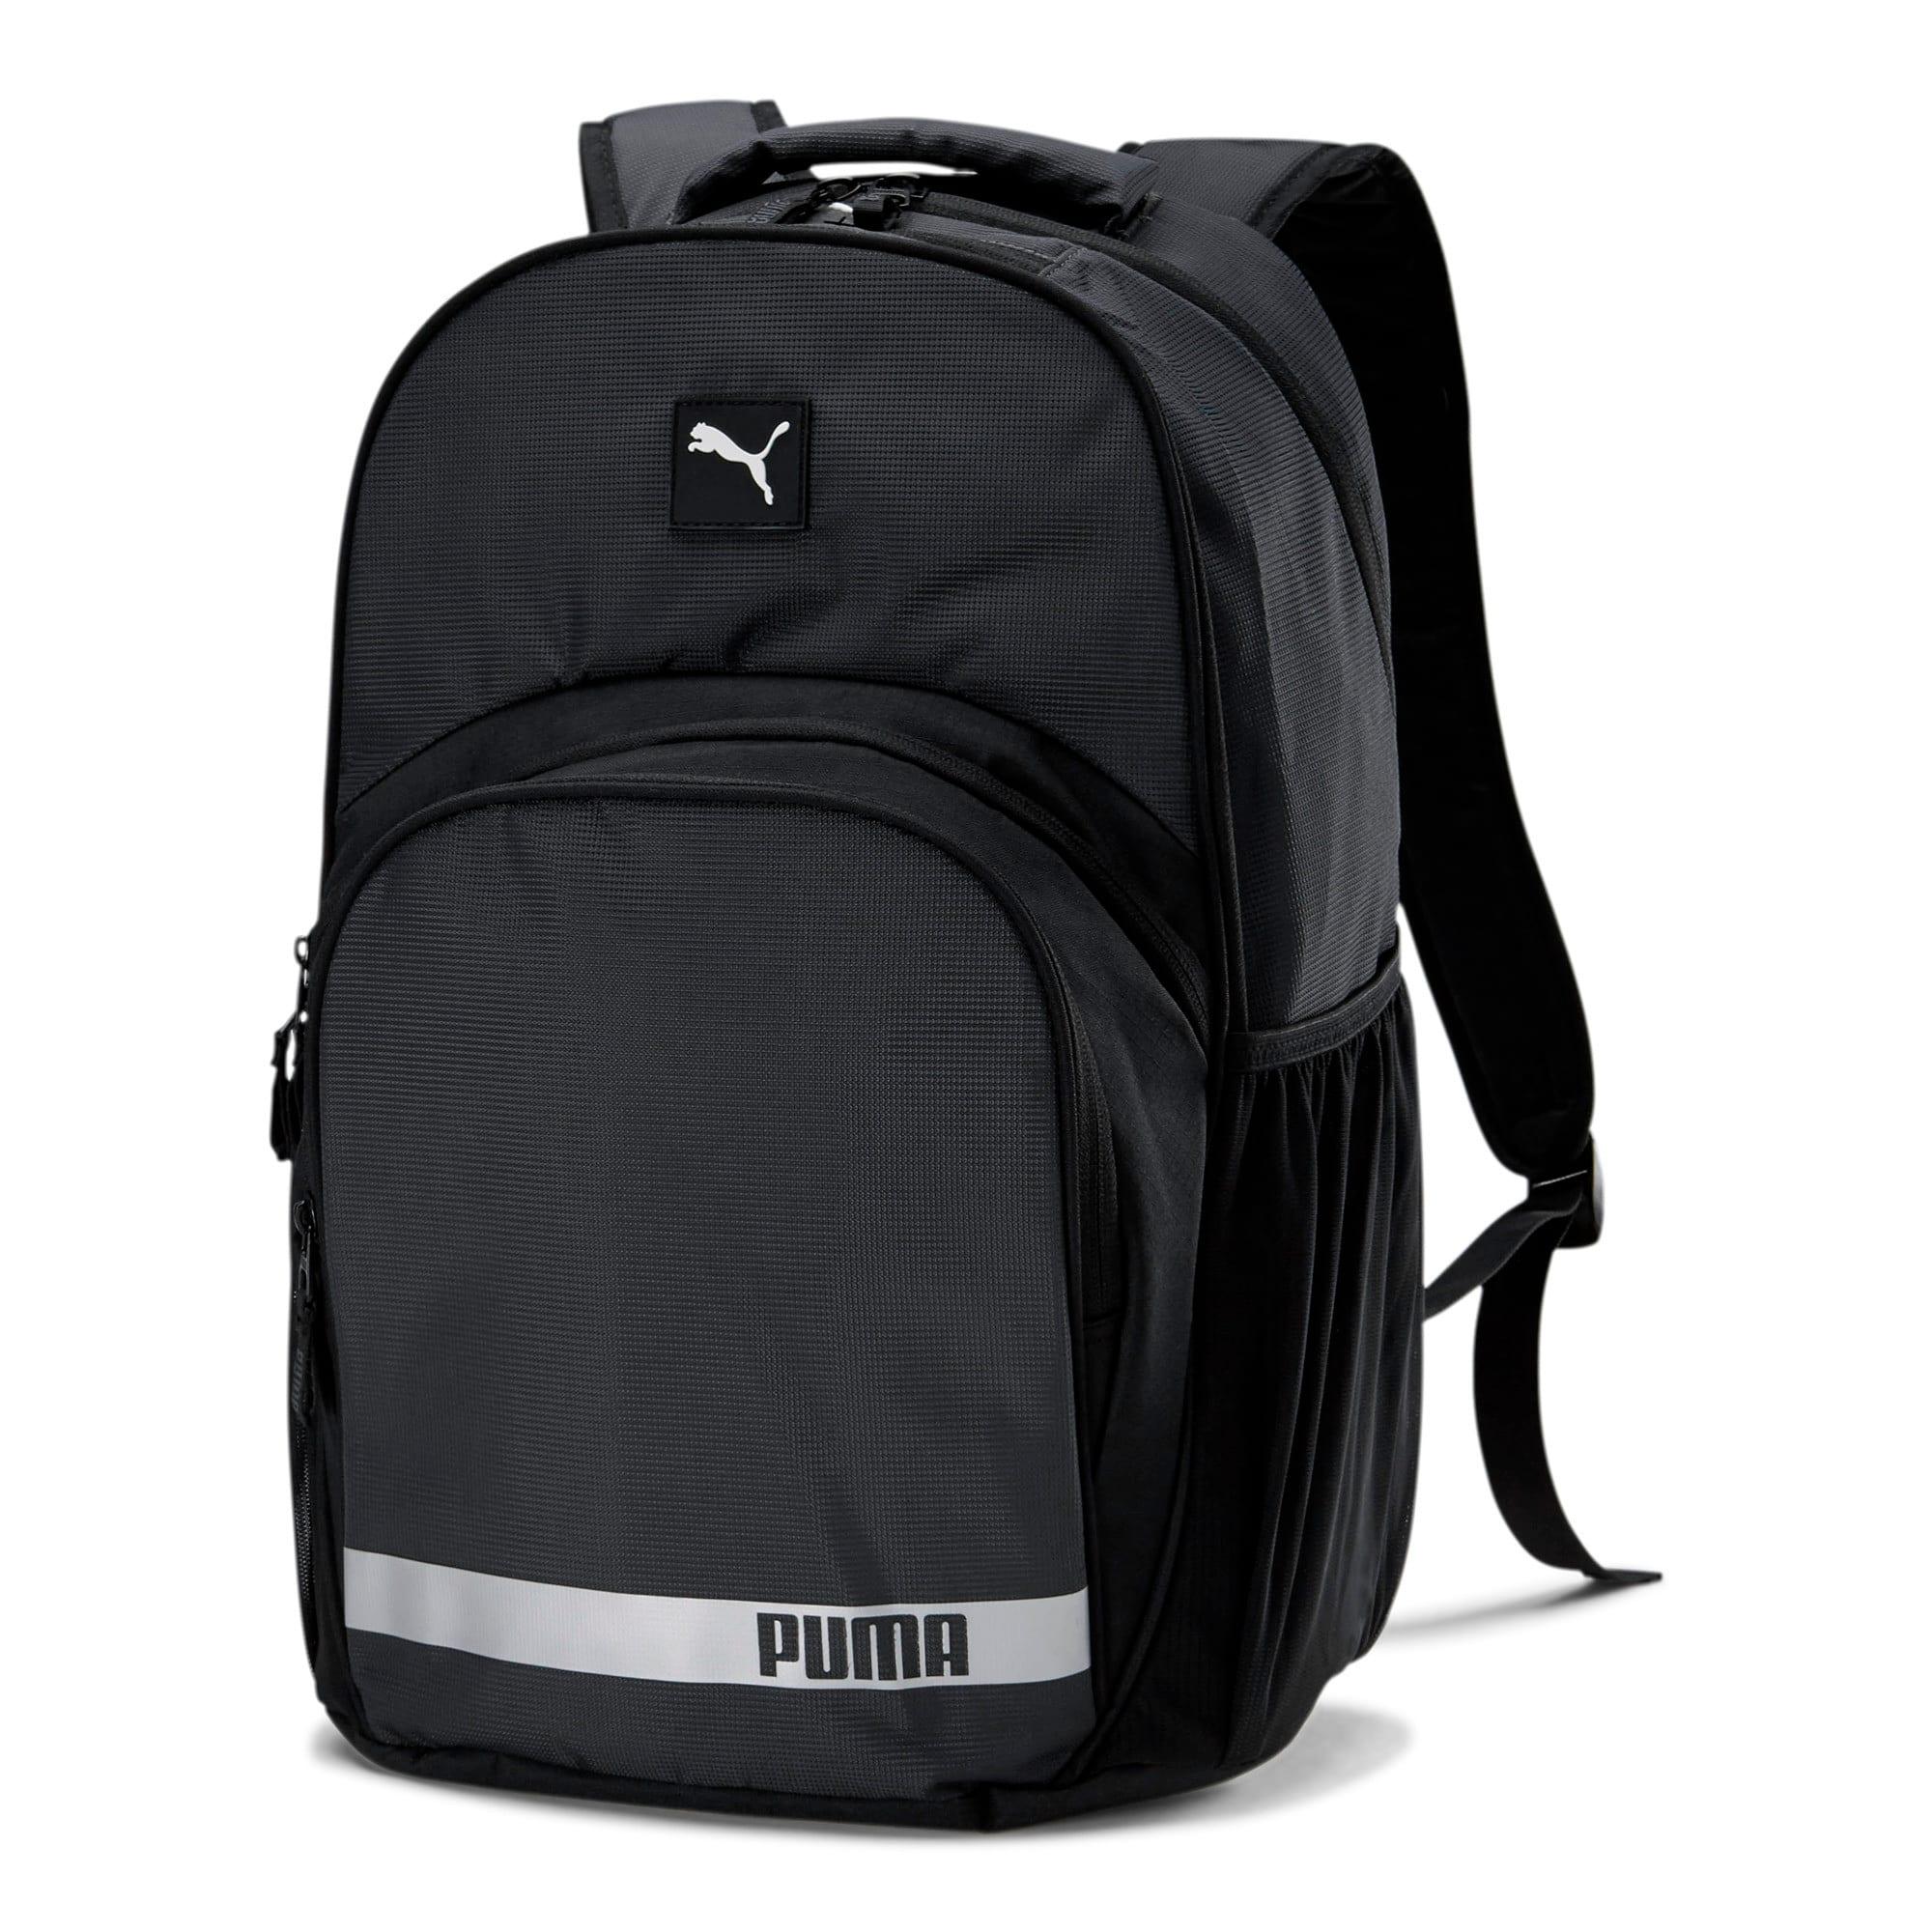 Thumbnail 1 of Formation 2.0 Ball Backpack, Dark Grey, medium